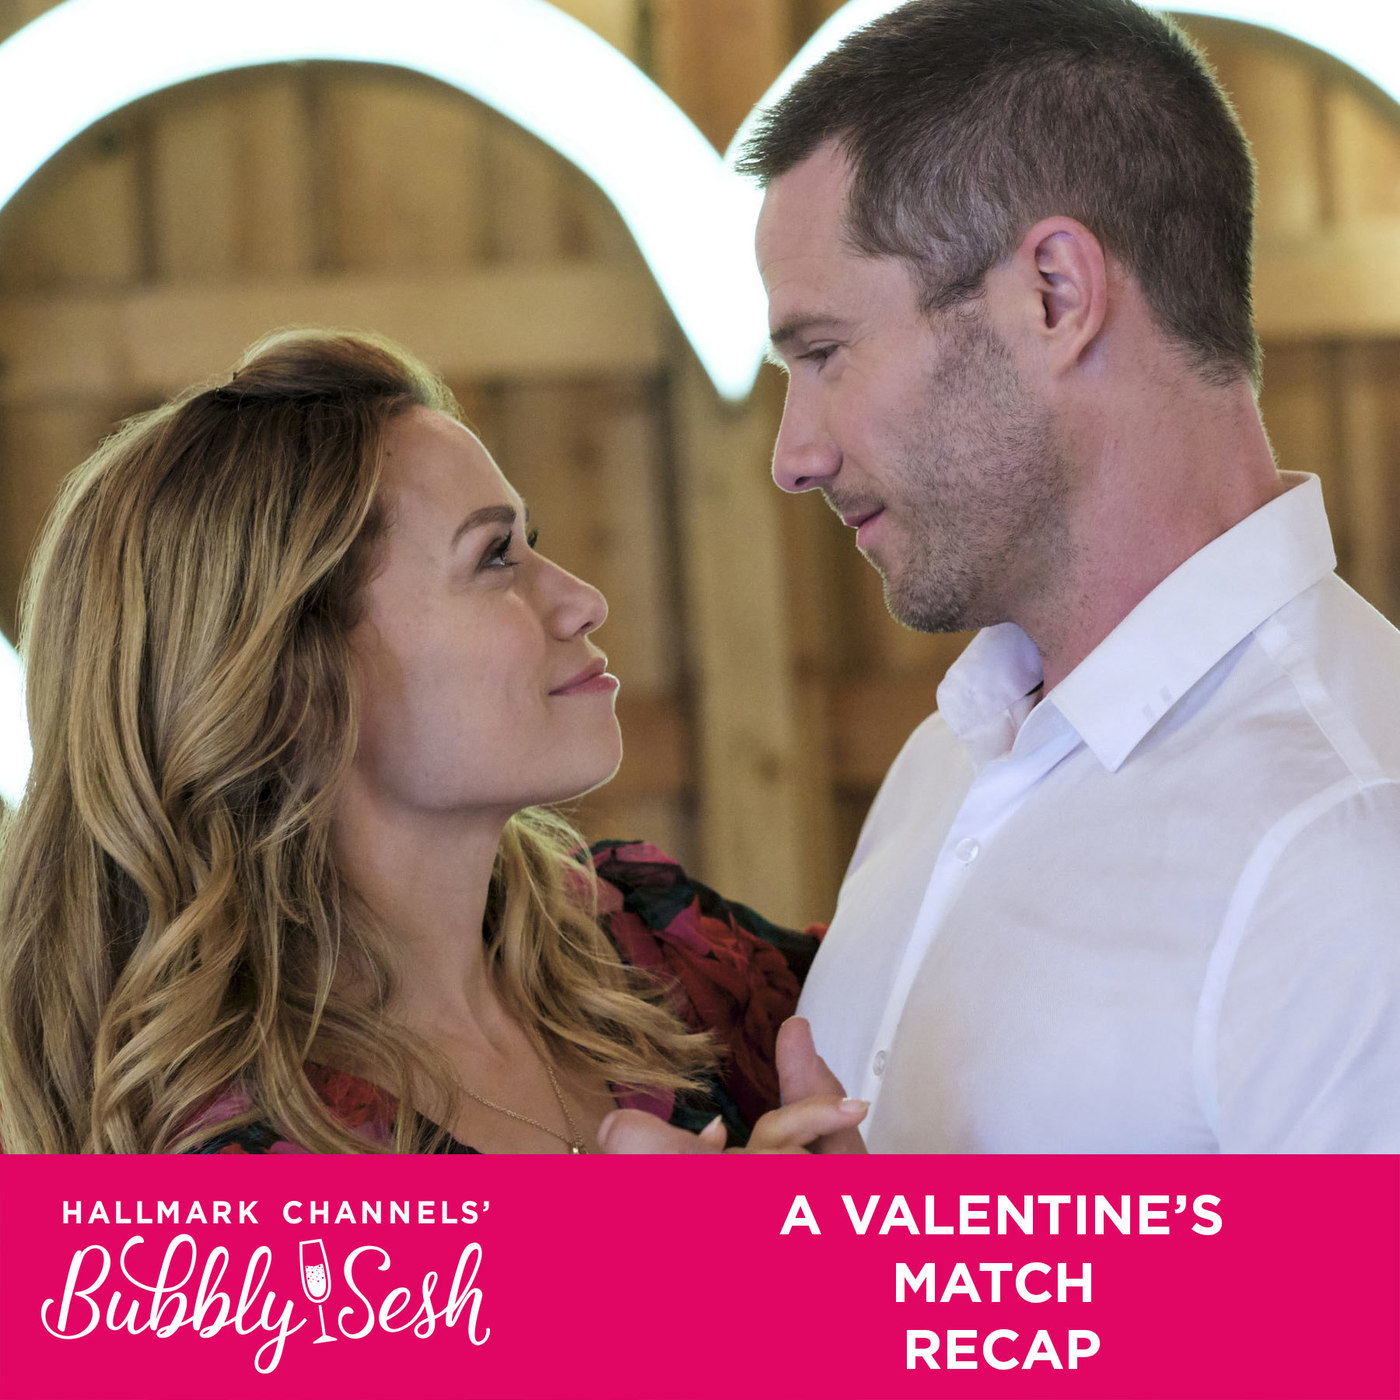 A Valentine's Match Recap